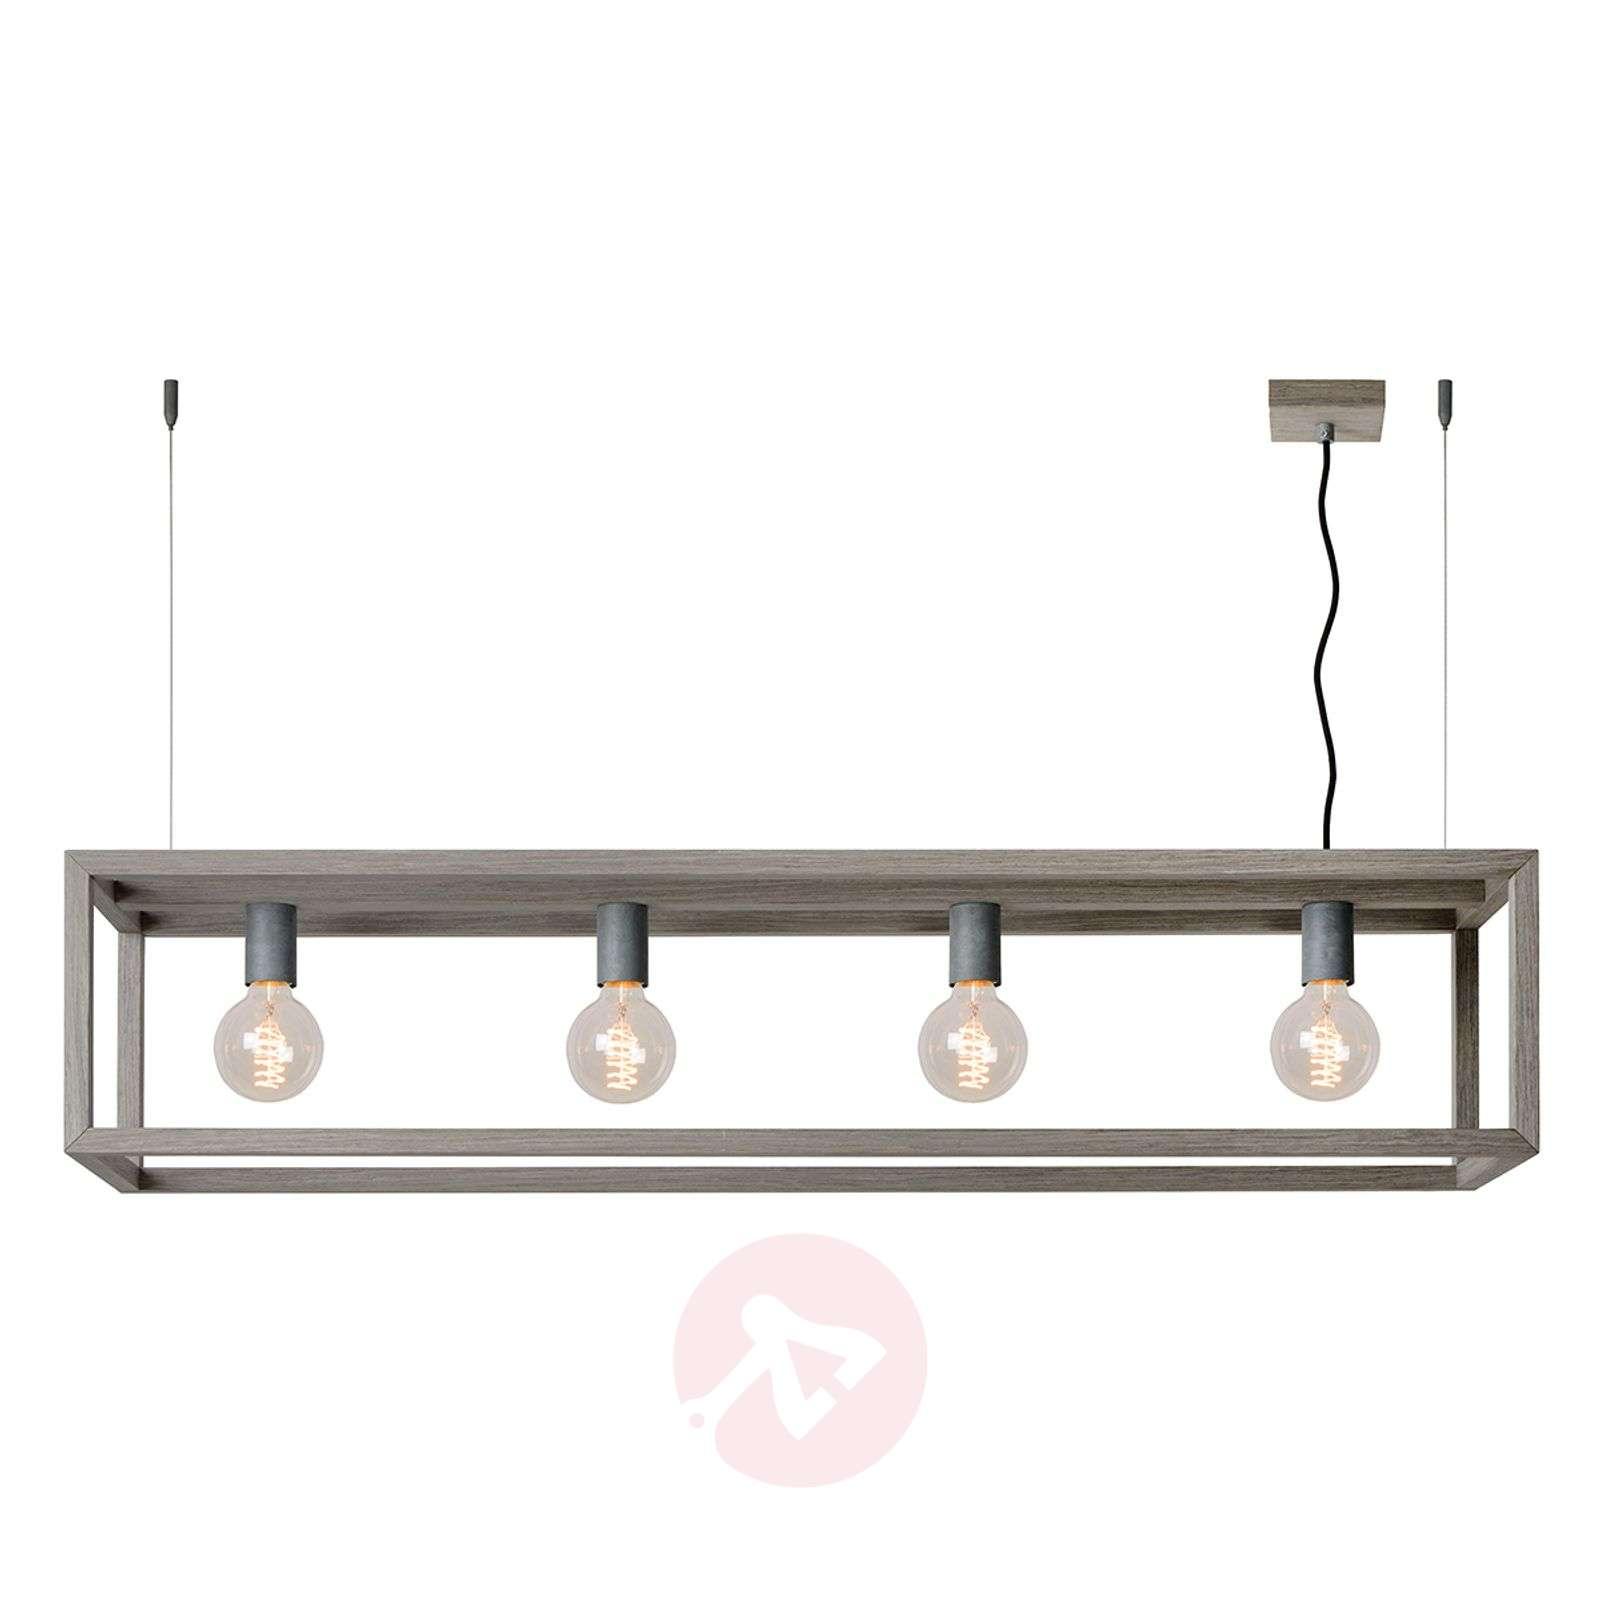 Trendy pendant light Oris with grey wood veneer-6055126-01